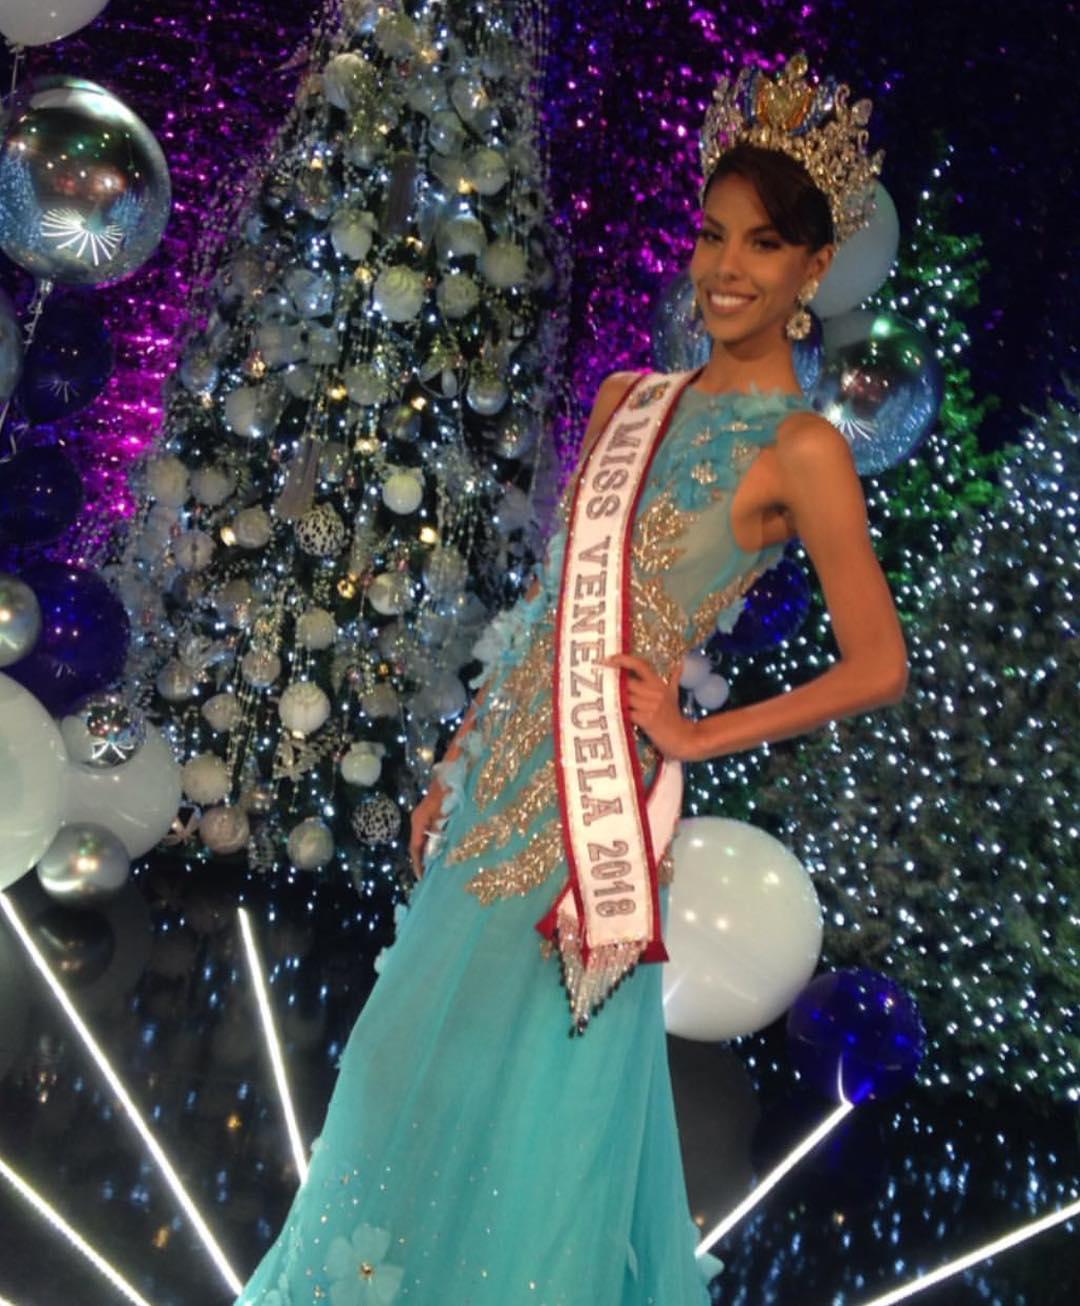 isabella rodriguez, top 40 de miss world 2019. - Página 2 Dryht810